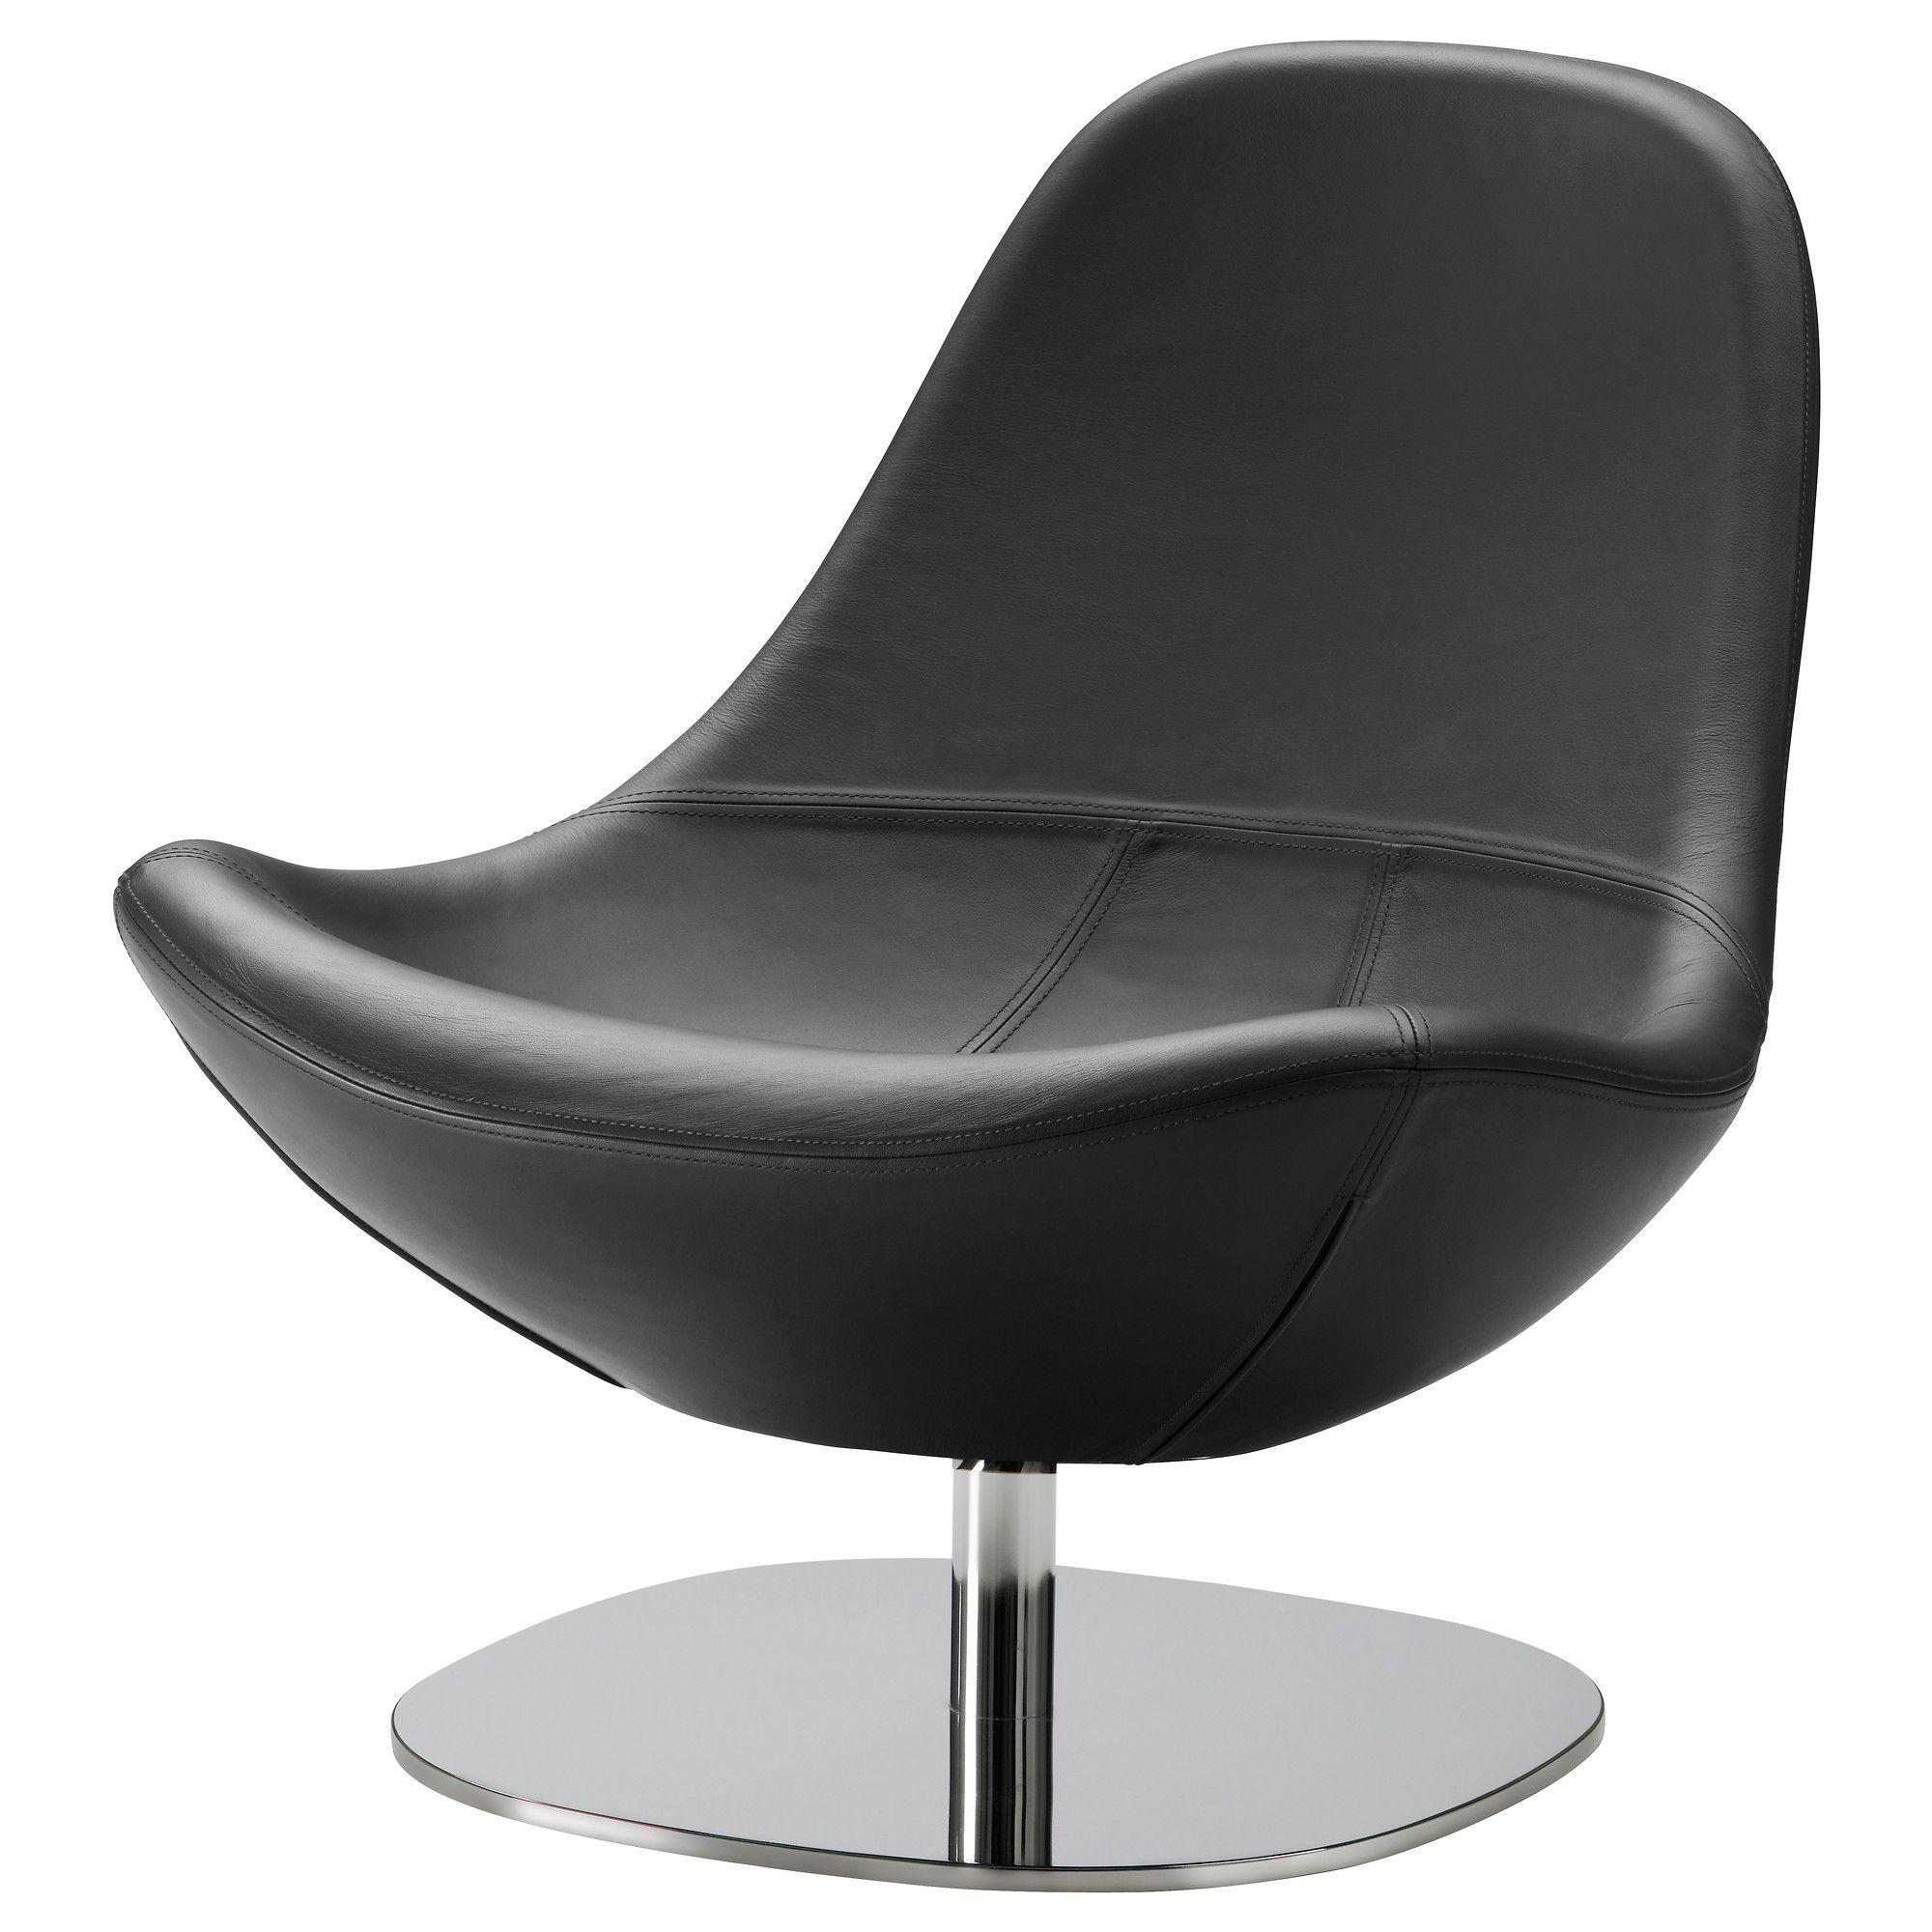 tirup drehsessel kavat schwarz ikea i am an ikea. Black Bedroom Furniture Sets. Home Design Ideas